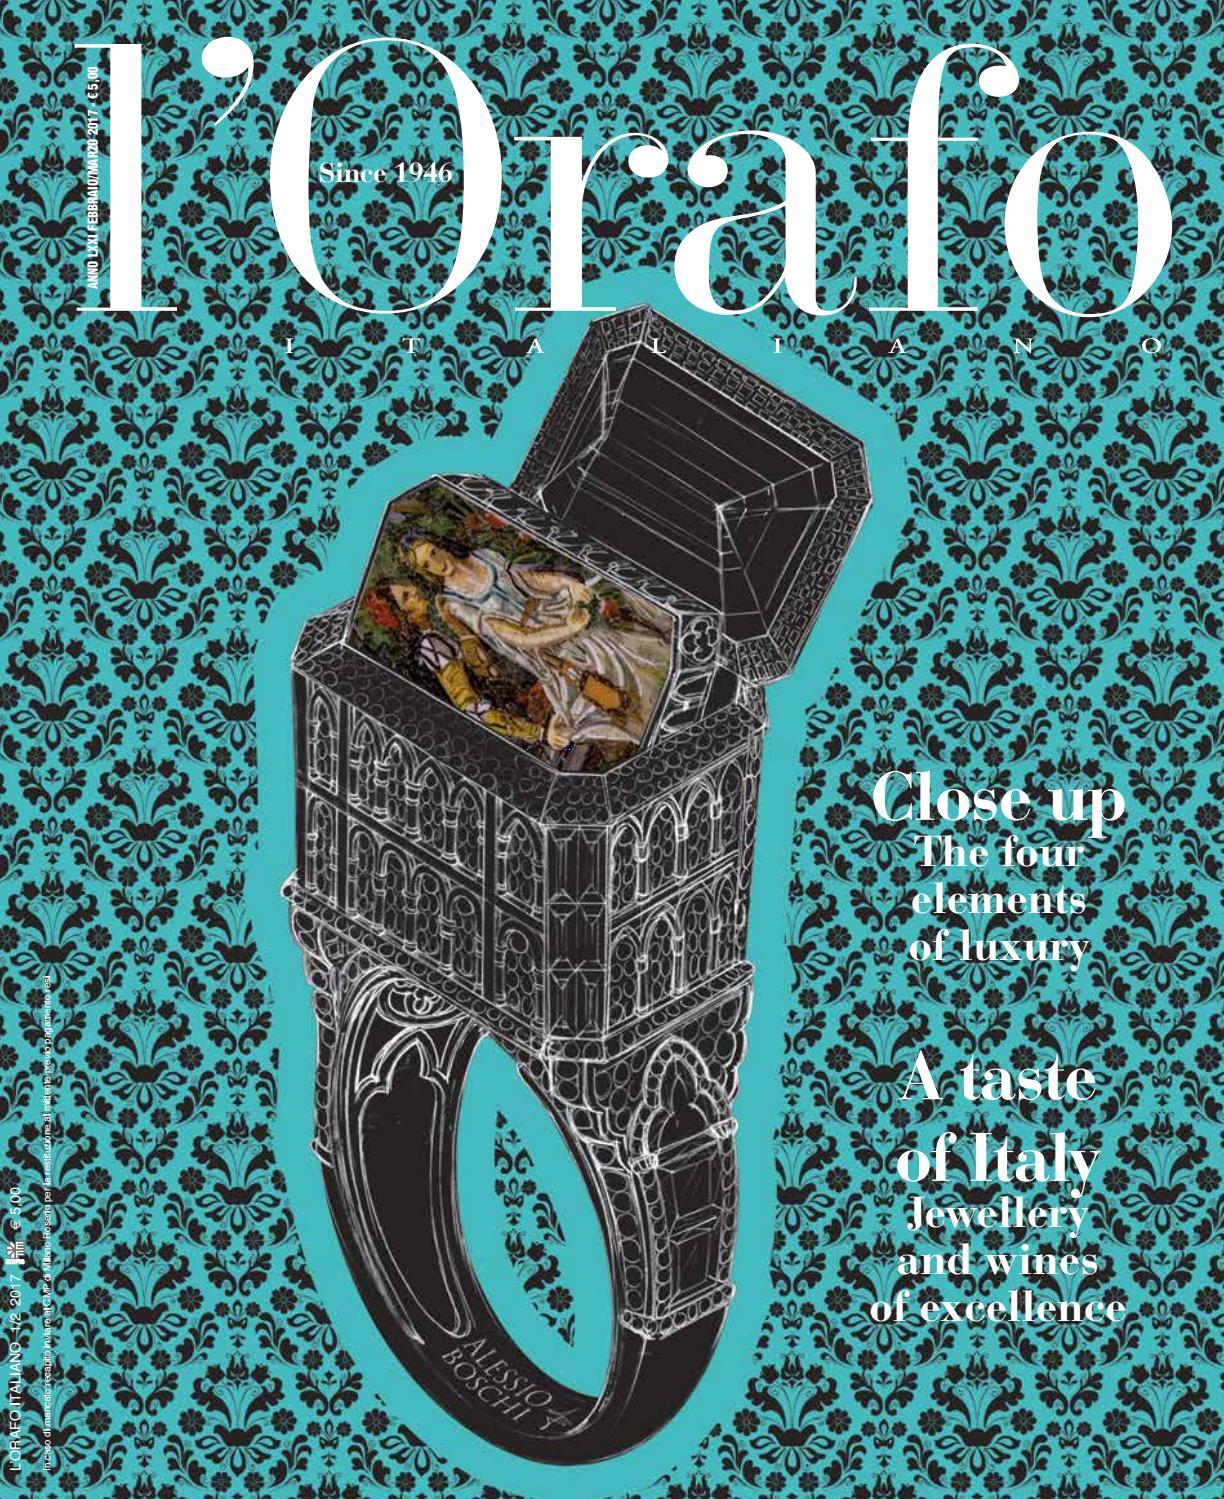 735c11a050 l'Orafo Italiano 02-03 2017 by Edifis - issuu